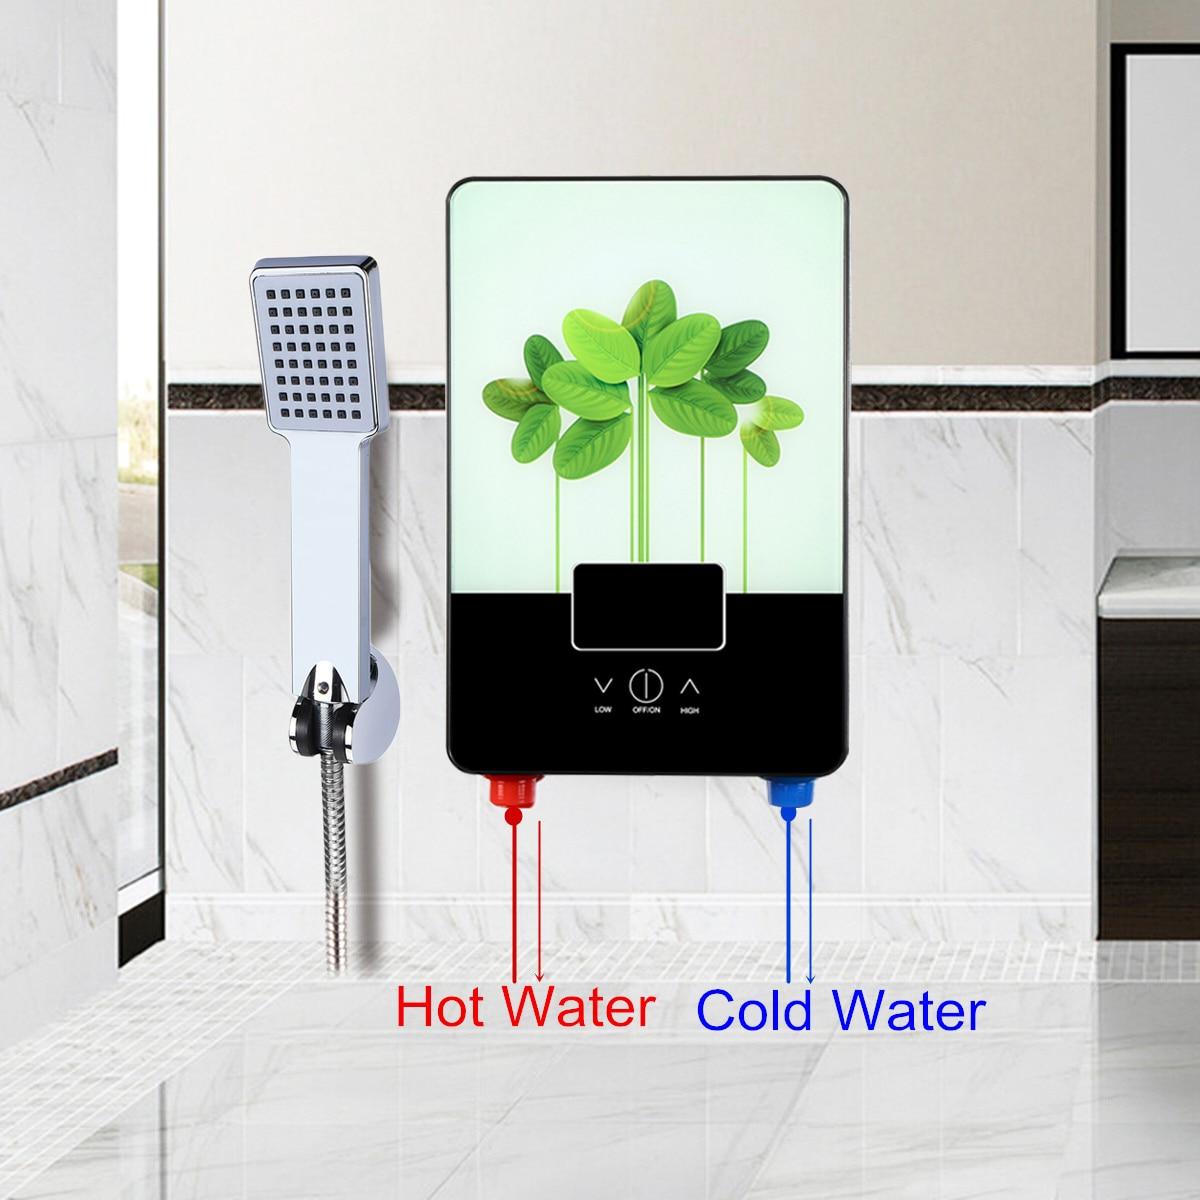 Calentador de agua eléctrico grifo hogar Baño Calentador de agua instantáneo inteligente velocidad caliente Calentador de agua ducha caliente - 2